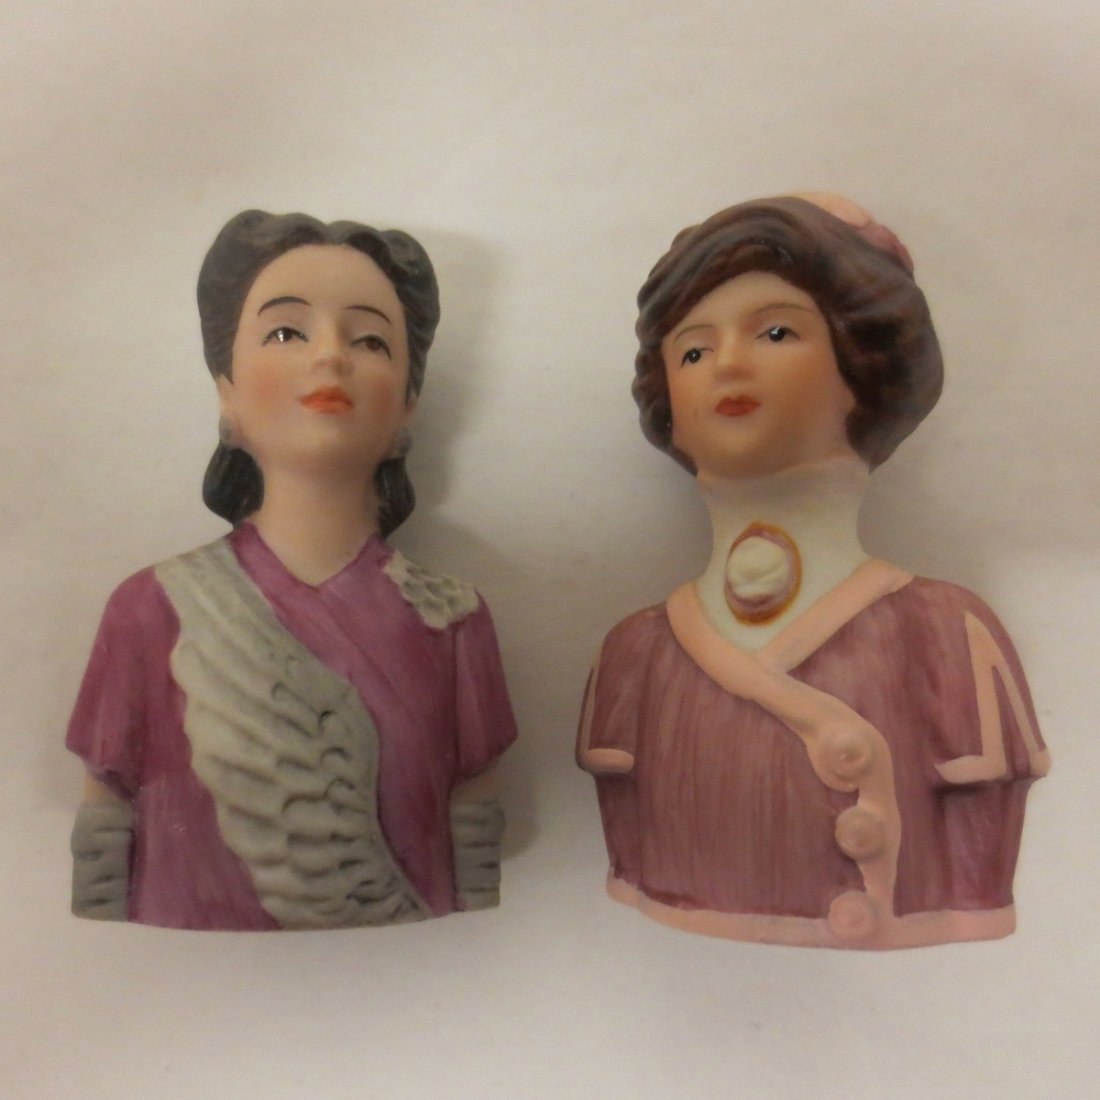 collection Avon thimble half dolls - 5